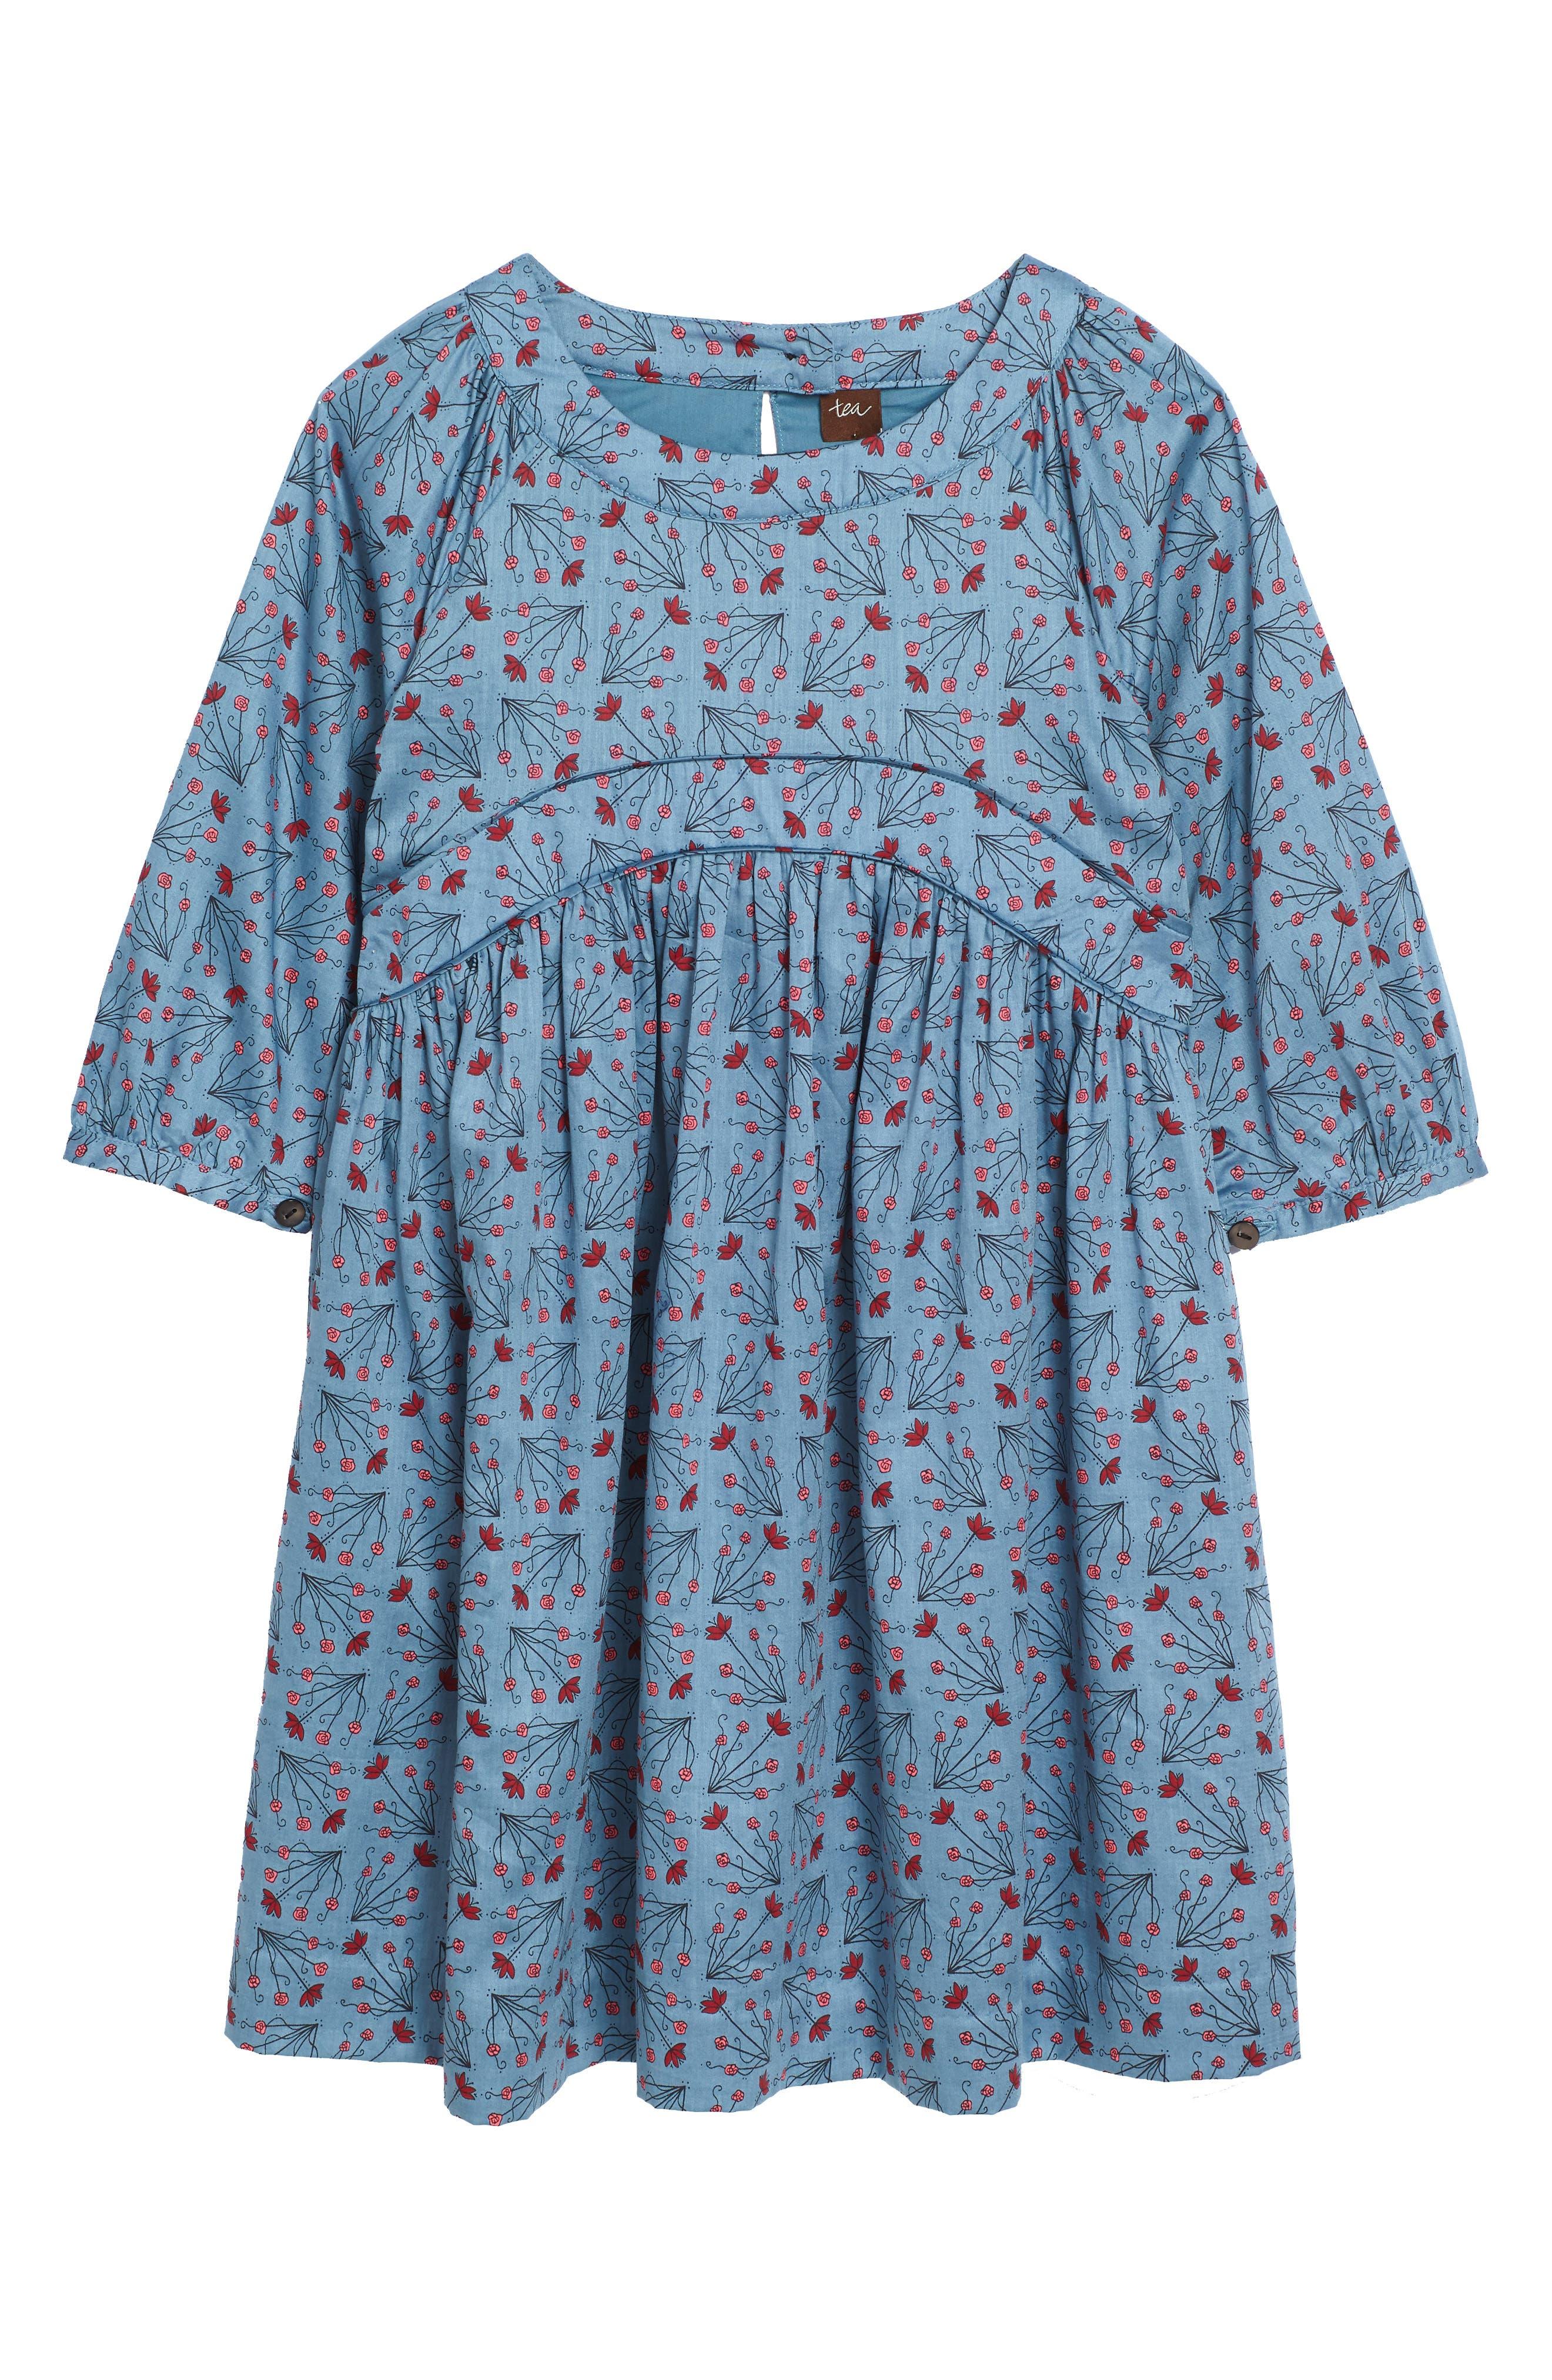 Main Image - Tea Collection Aviemore Empire Dress (Toddler Girls, Little Girls & Big Girls)